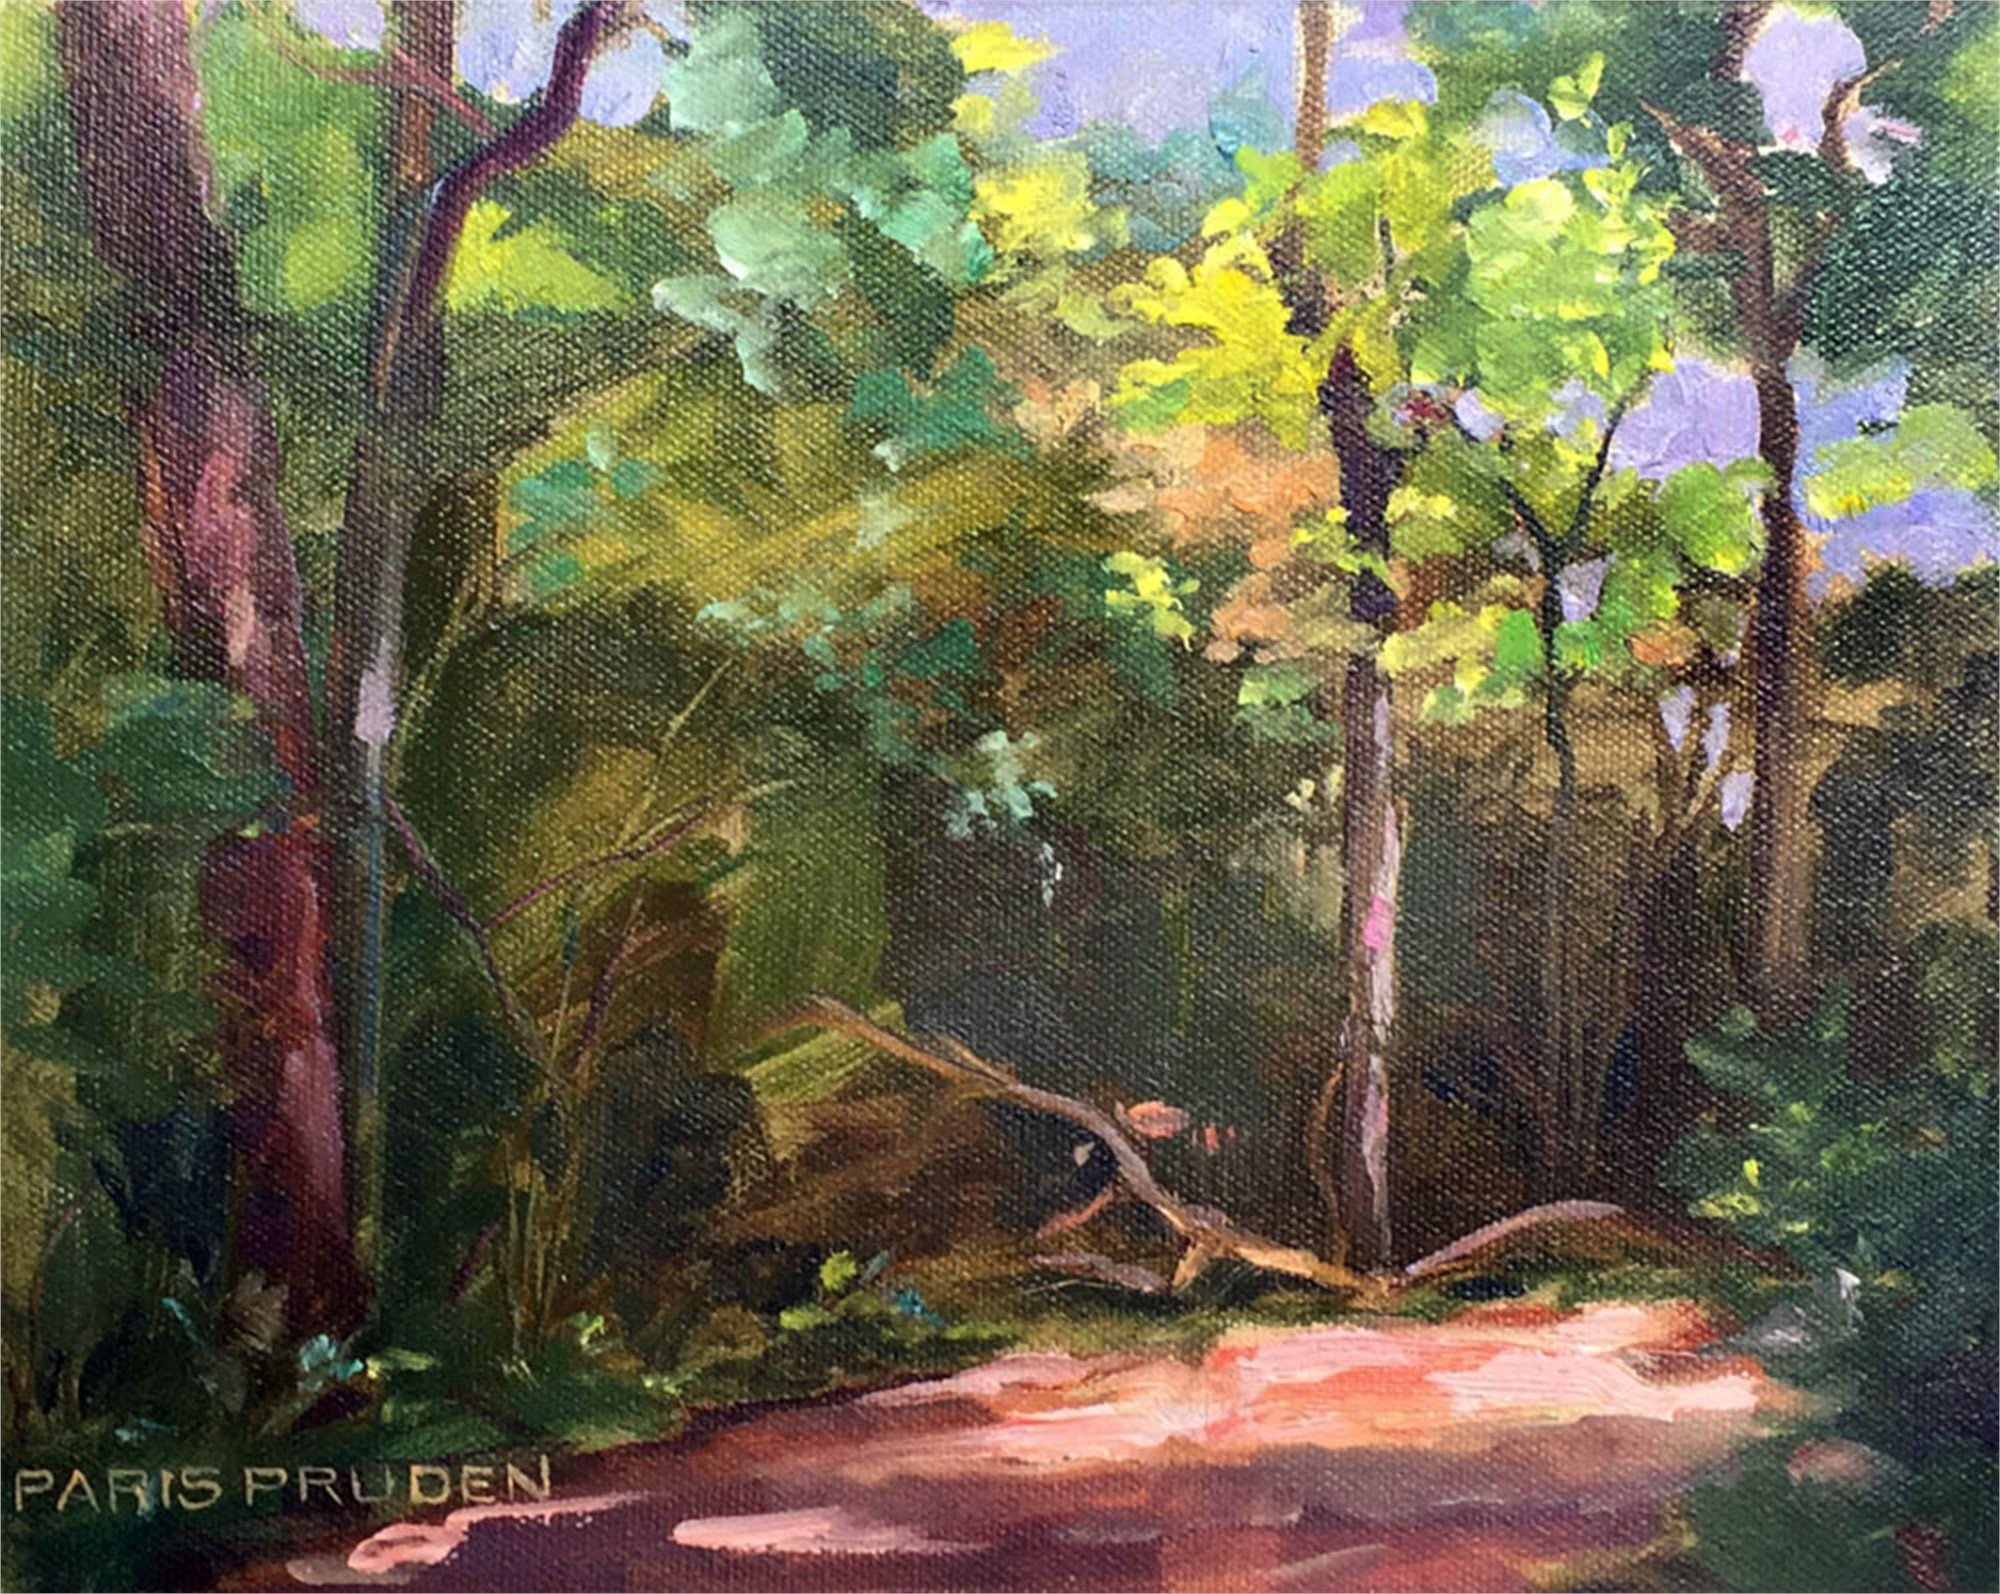 Deep in the Woods by Nancy Paris Pruden